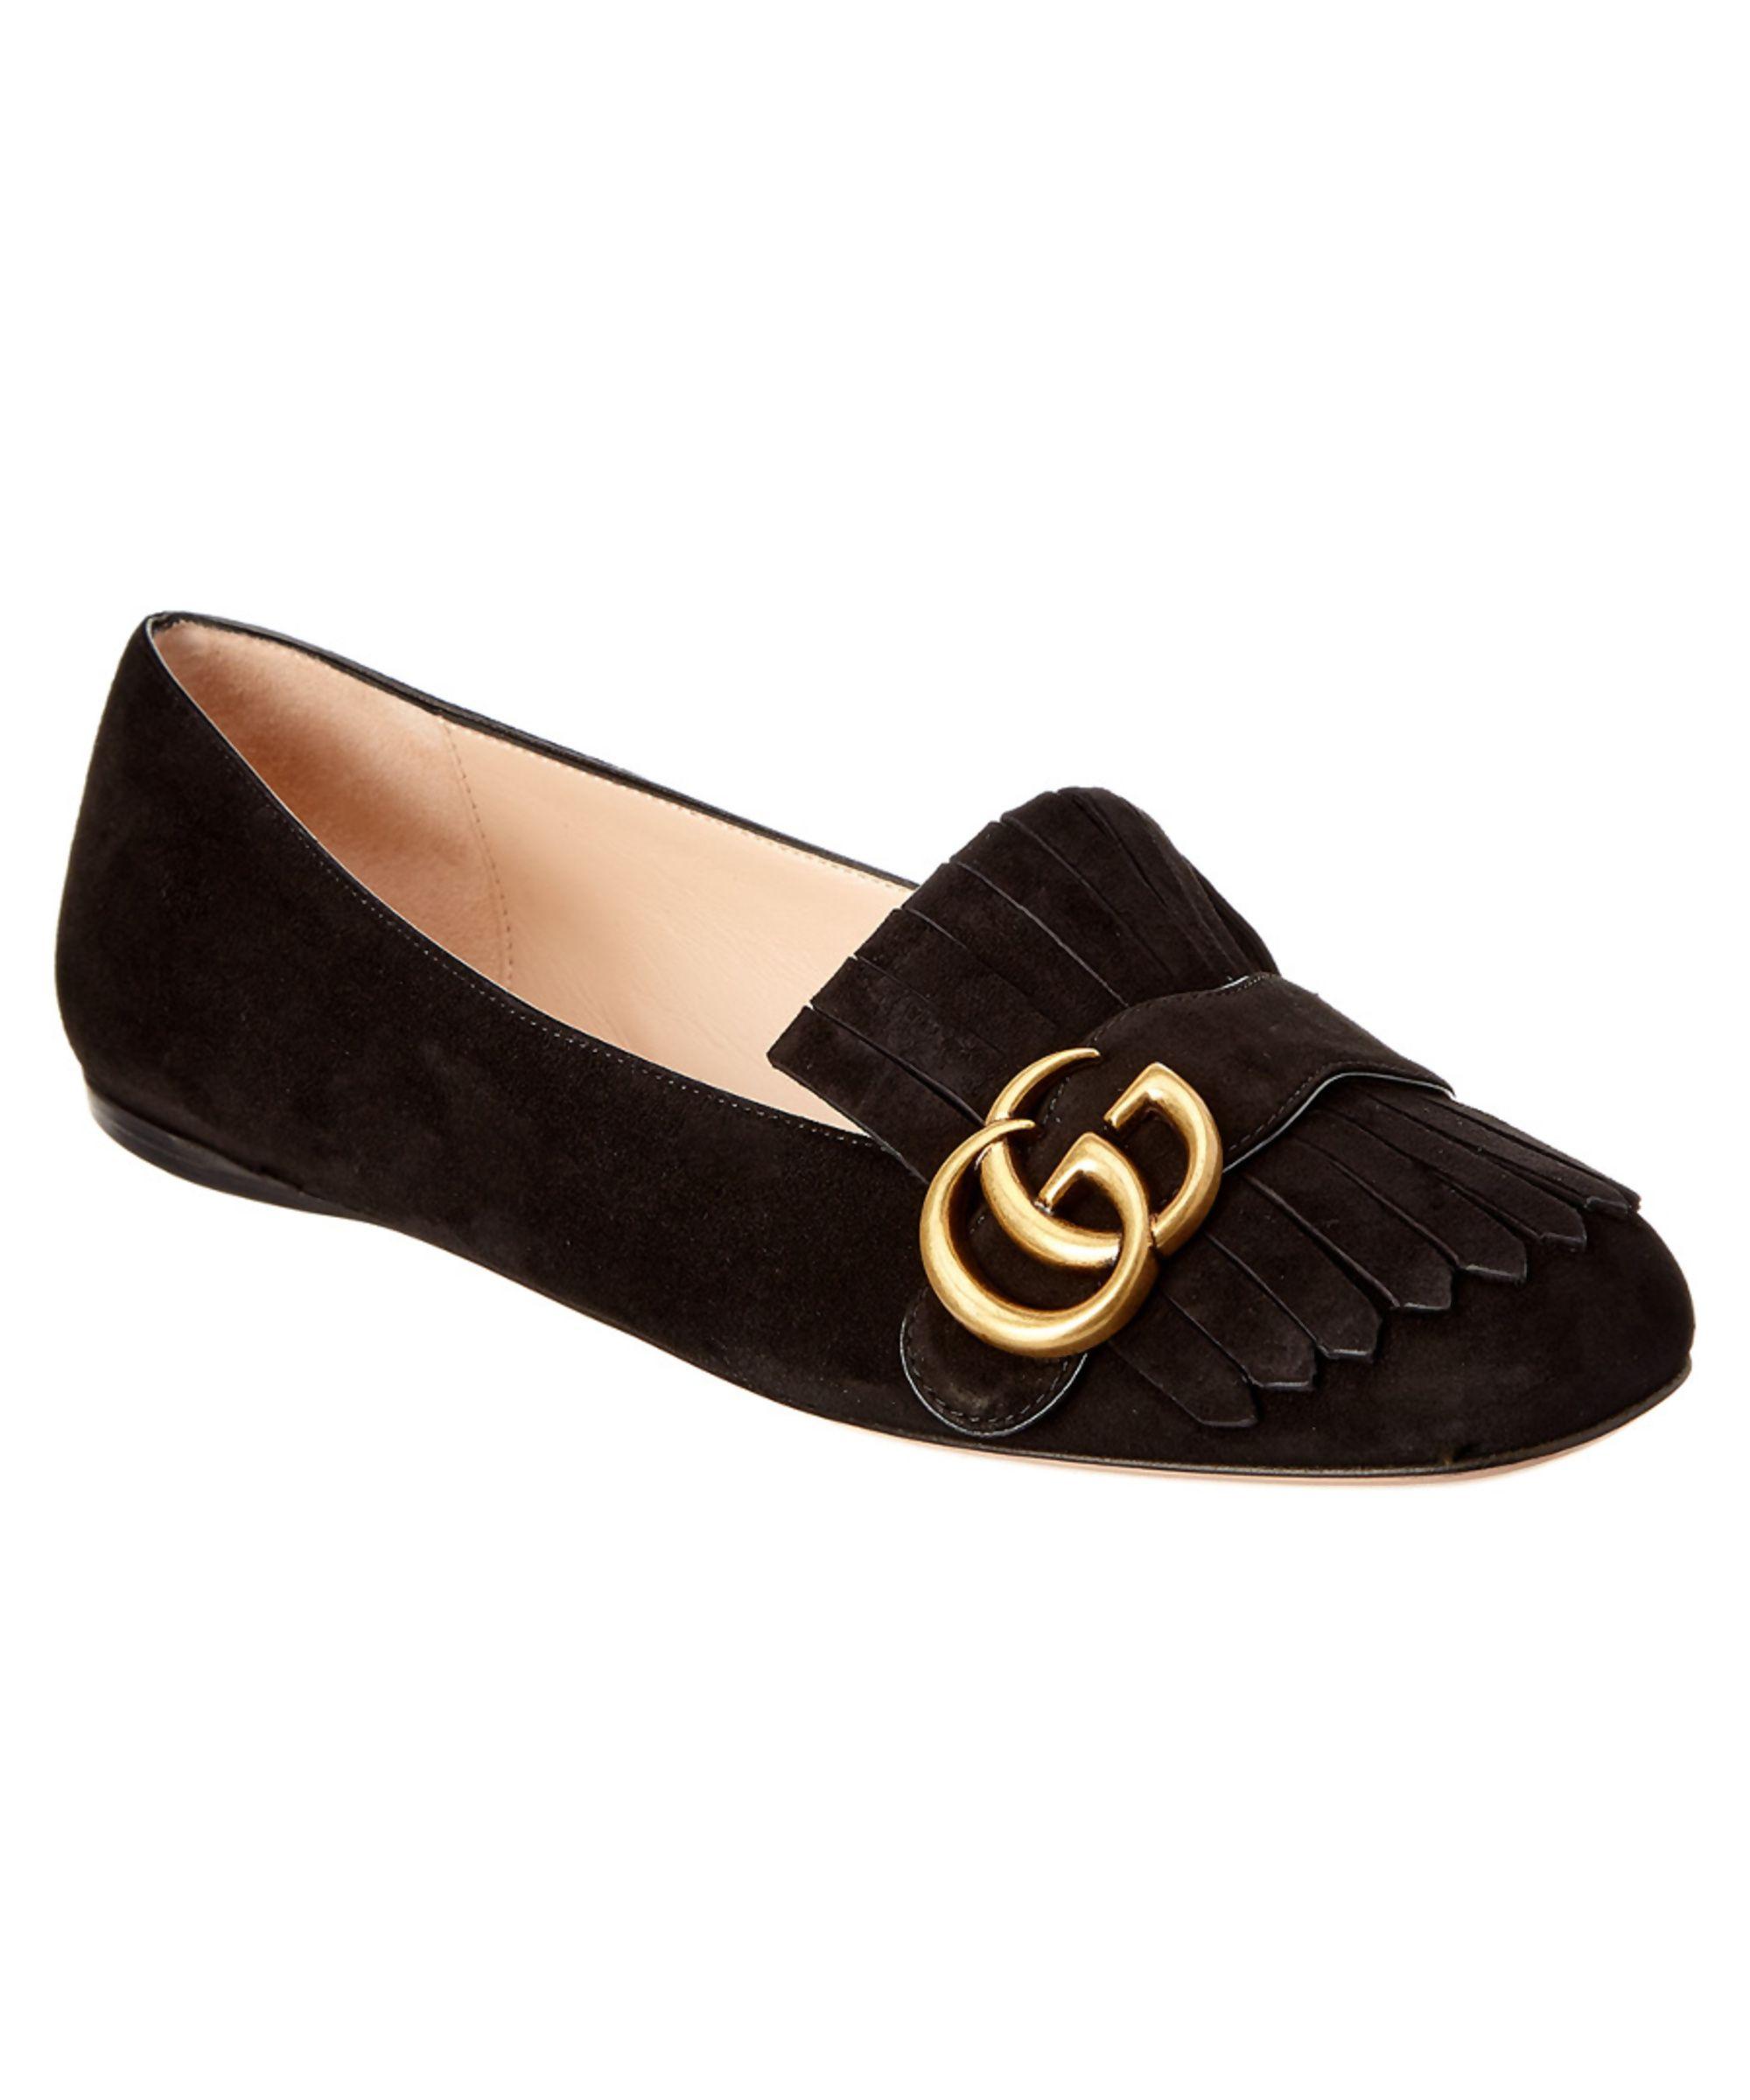 5d30b080e GUCCI | Gucci Suede Ballet Flat #Shoes #Flats #GUCCI | Fashion ...